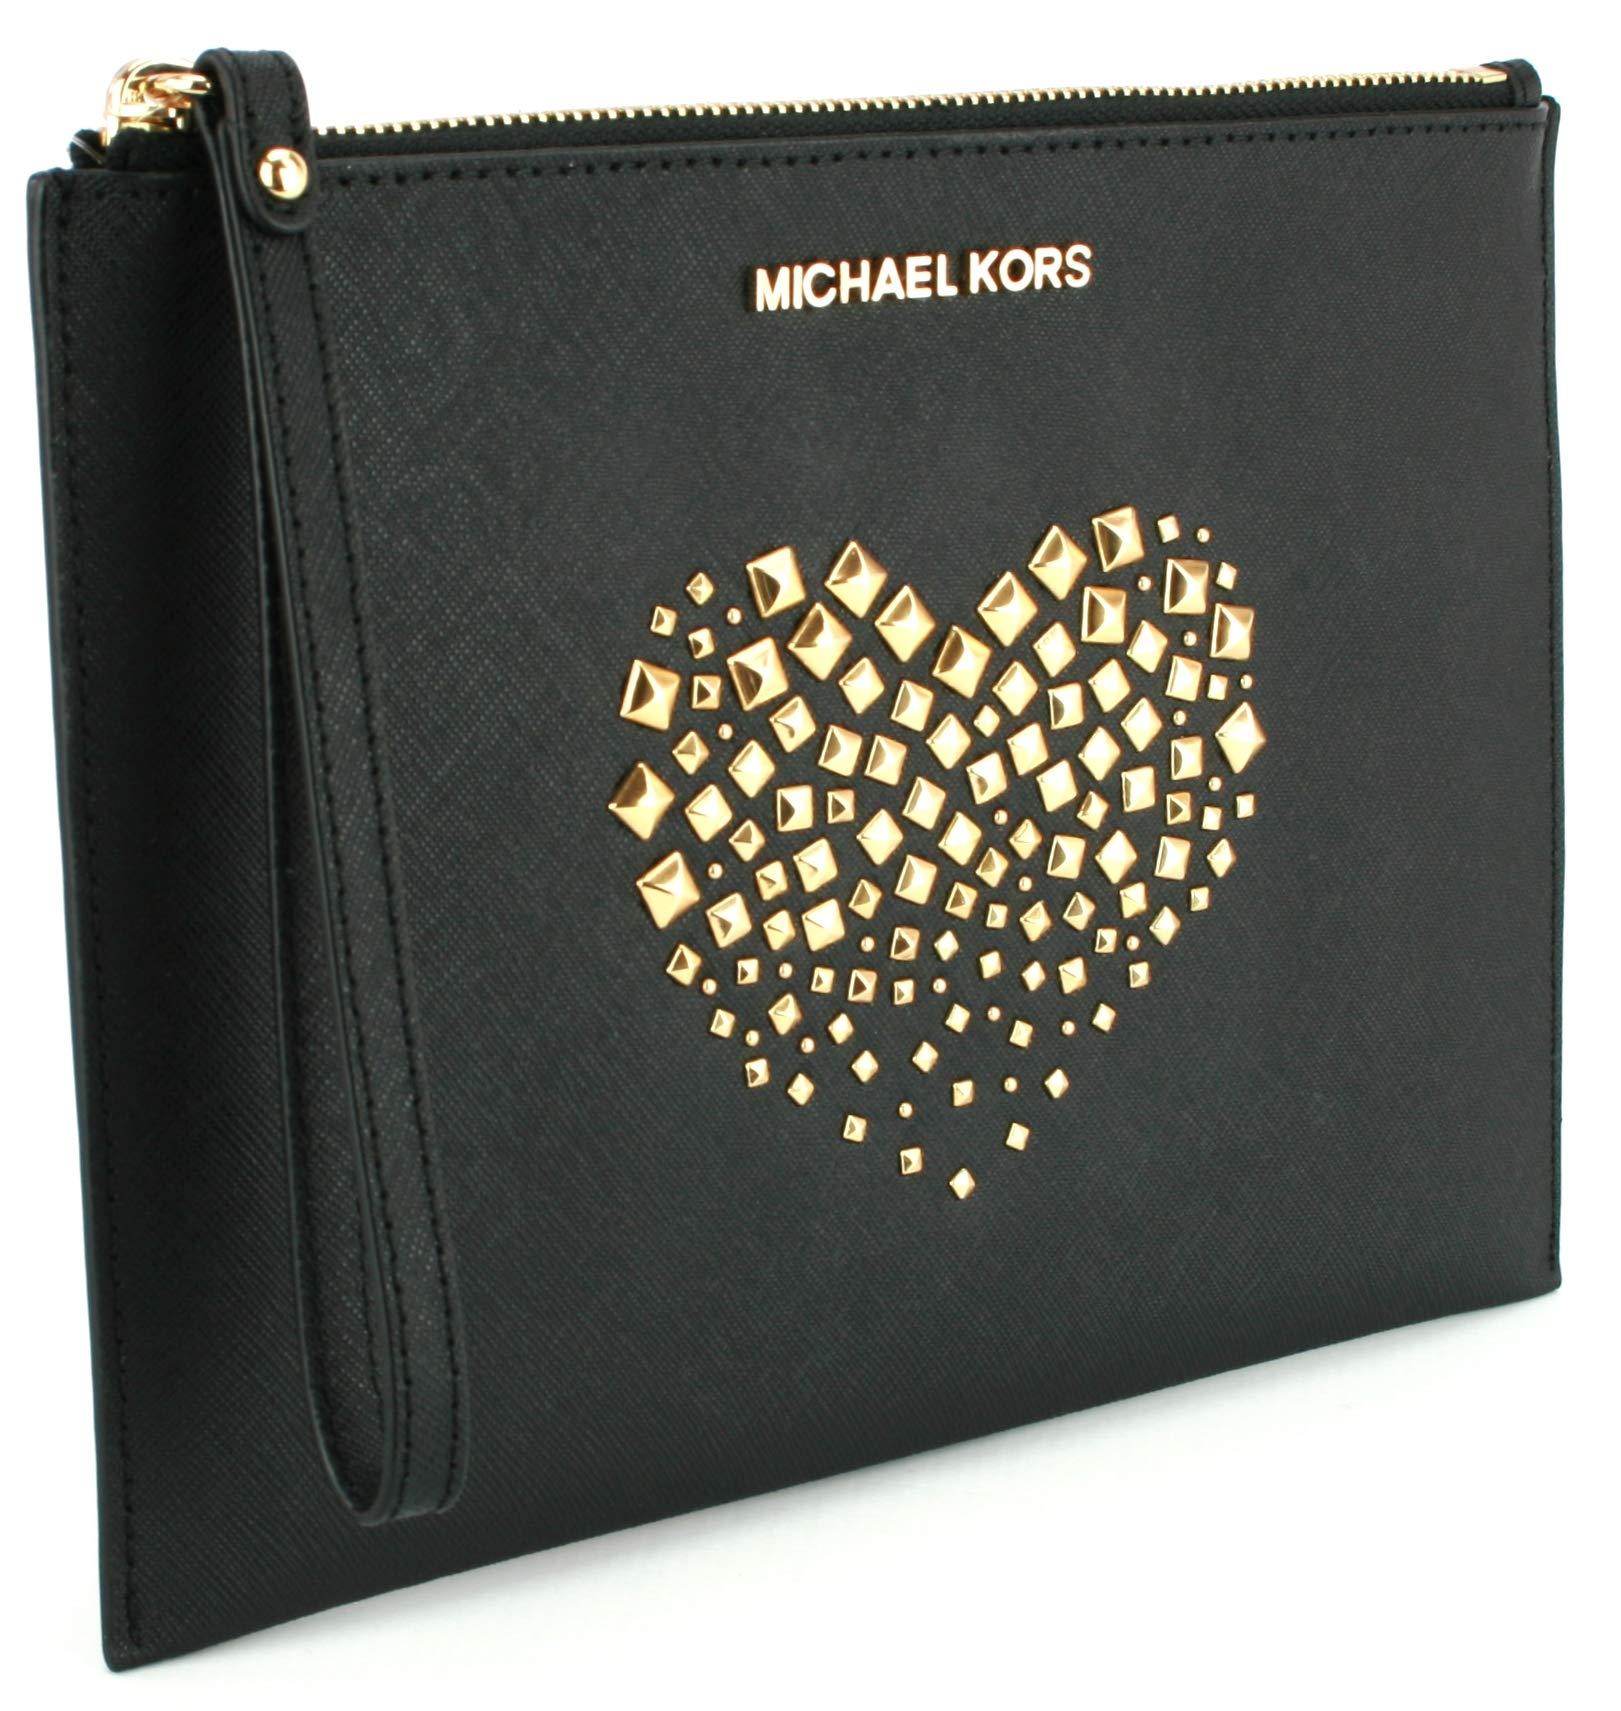 Michael Kors Jet Set Heart Studded XL Giftables Zip Leather Clutch Wristlet (Black)